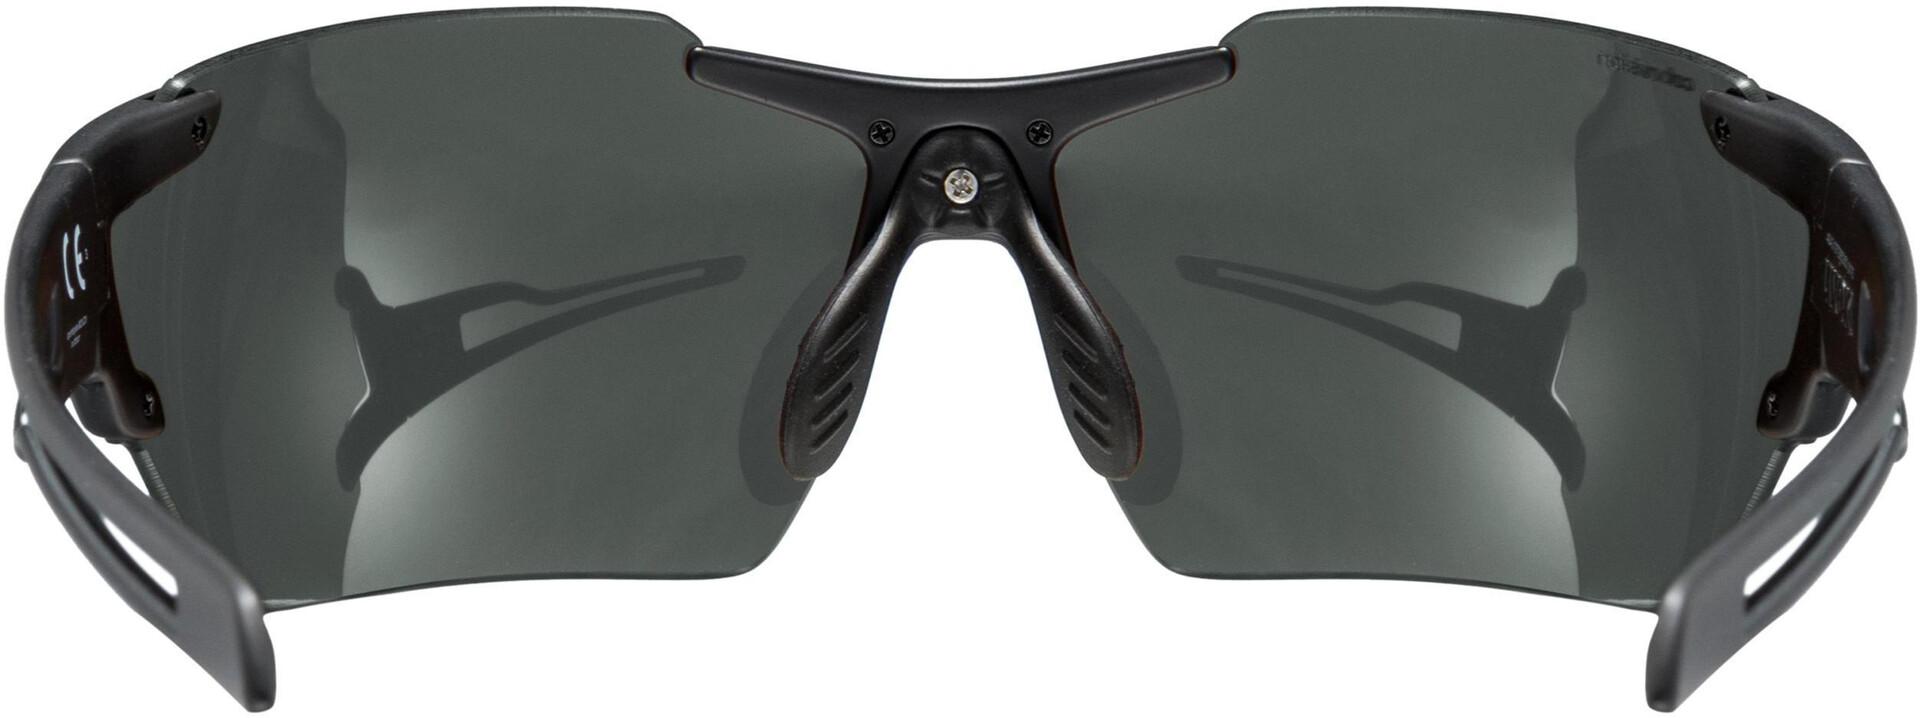 Mountain Bike Enduro Cycling Sunglasses UVEX Anti-Fog 99.9/% UVA//UVB Protection